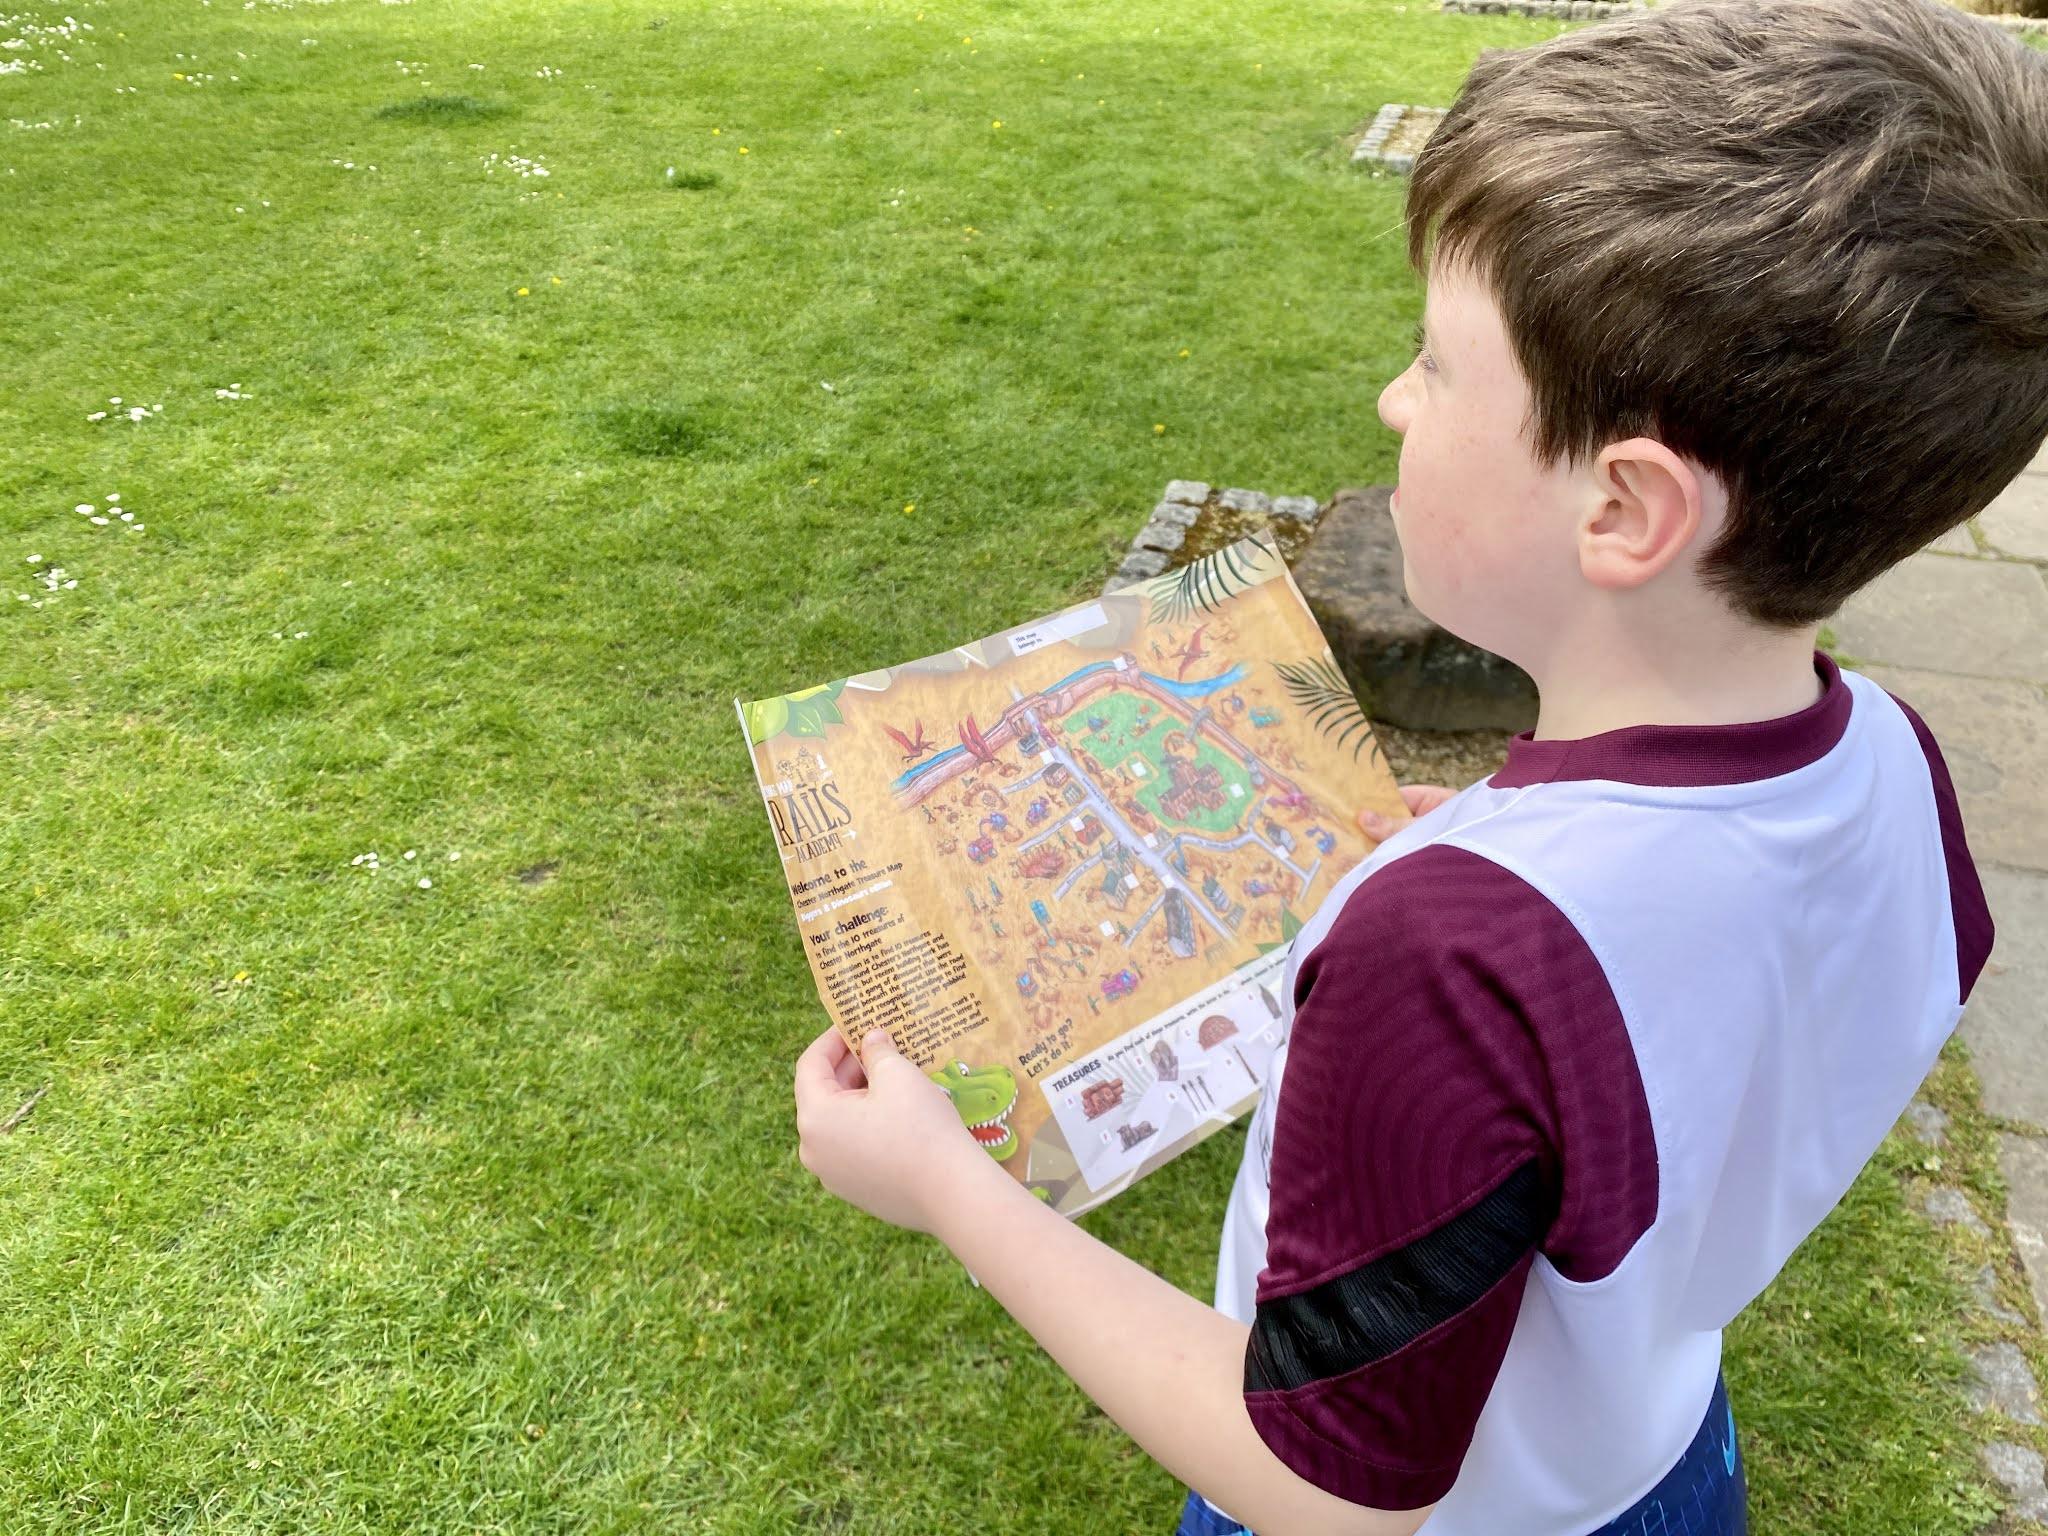 Boy holding a treasure map